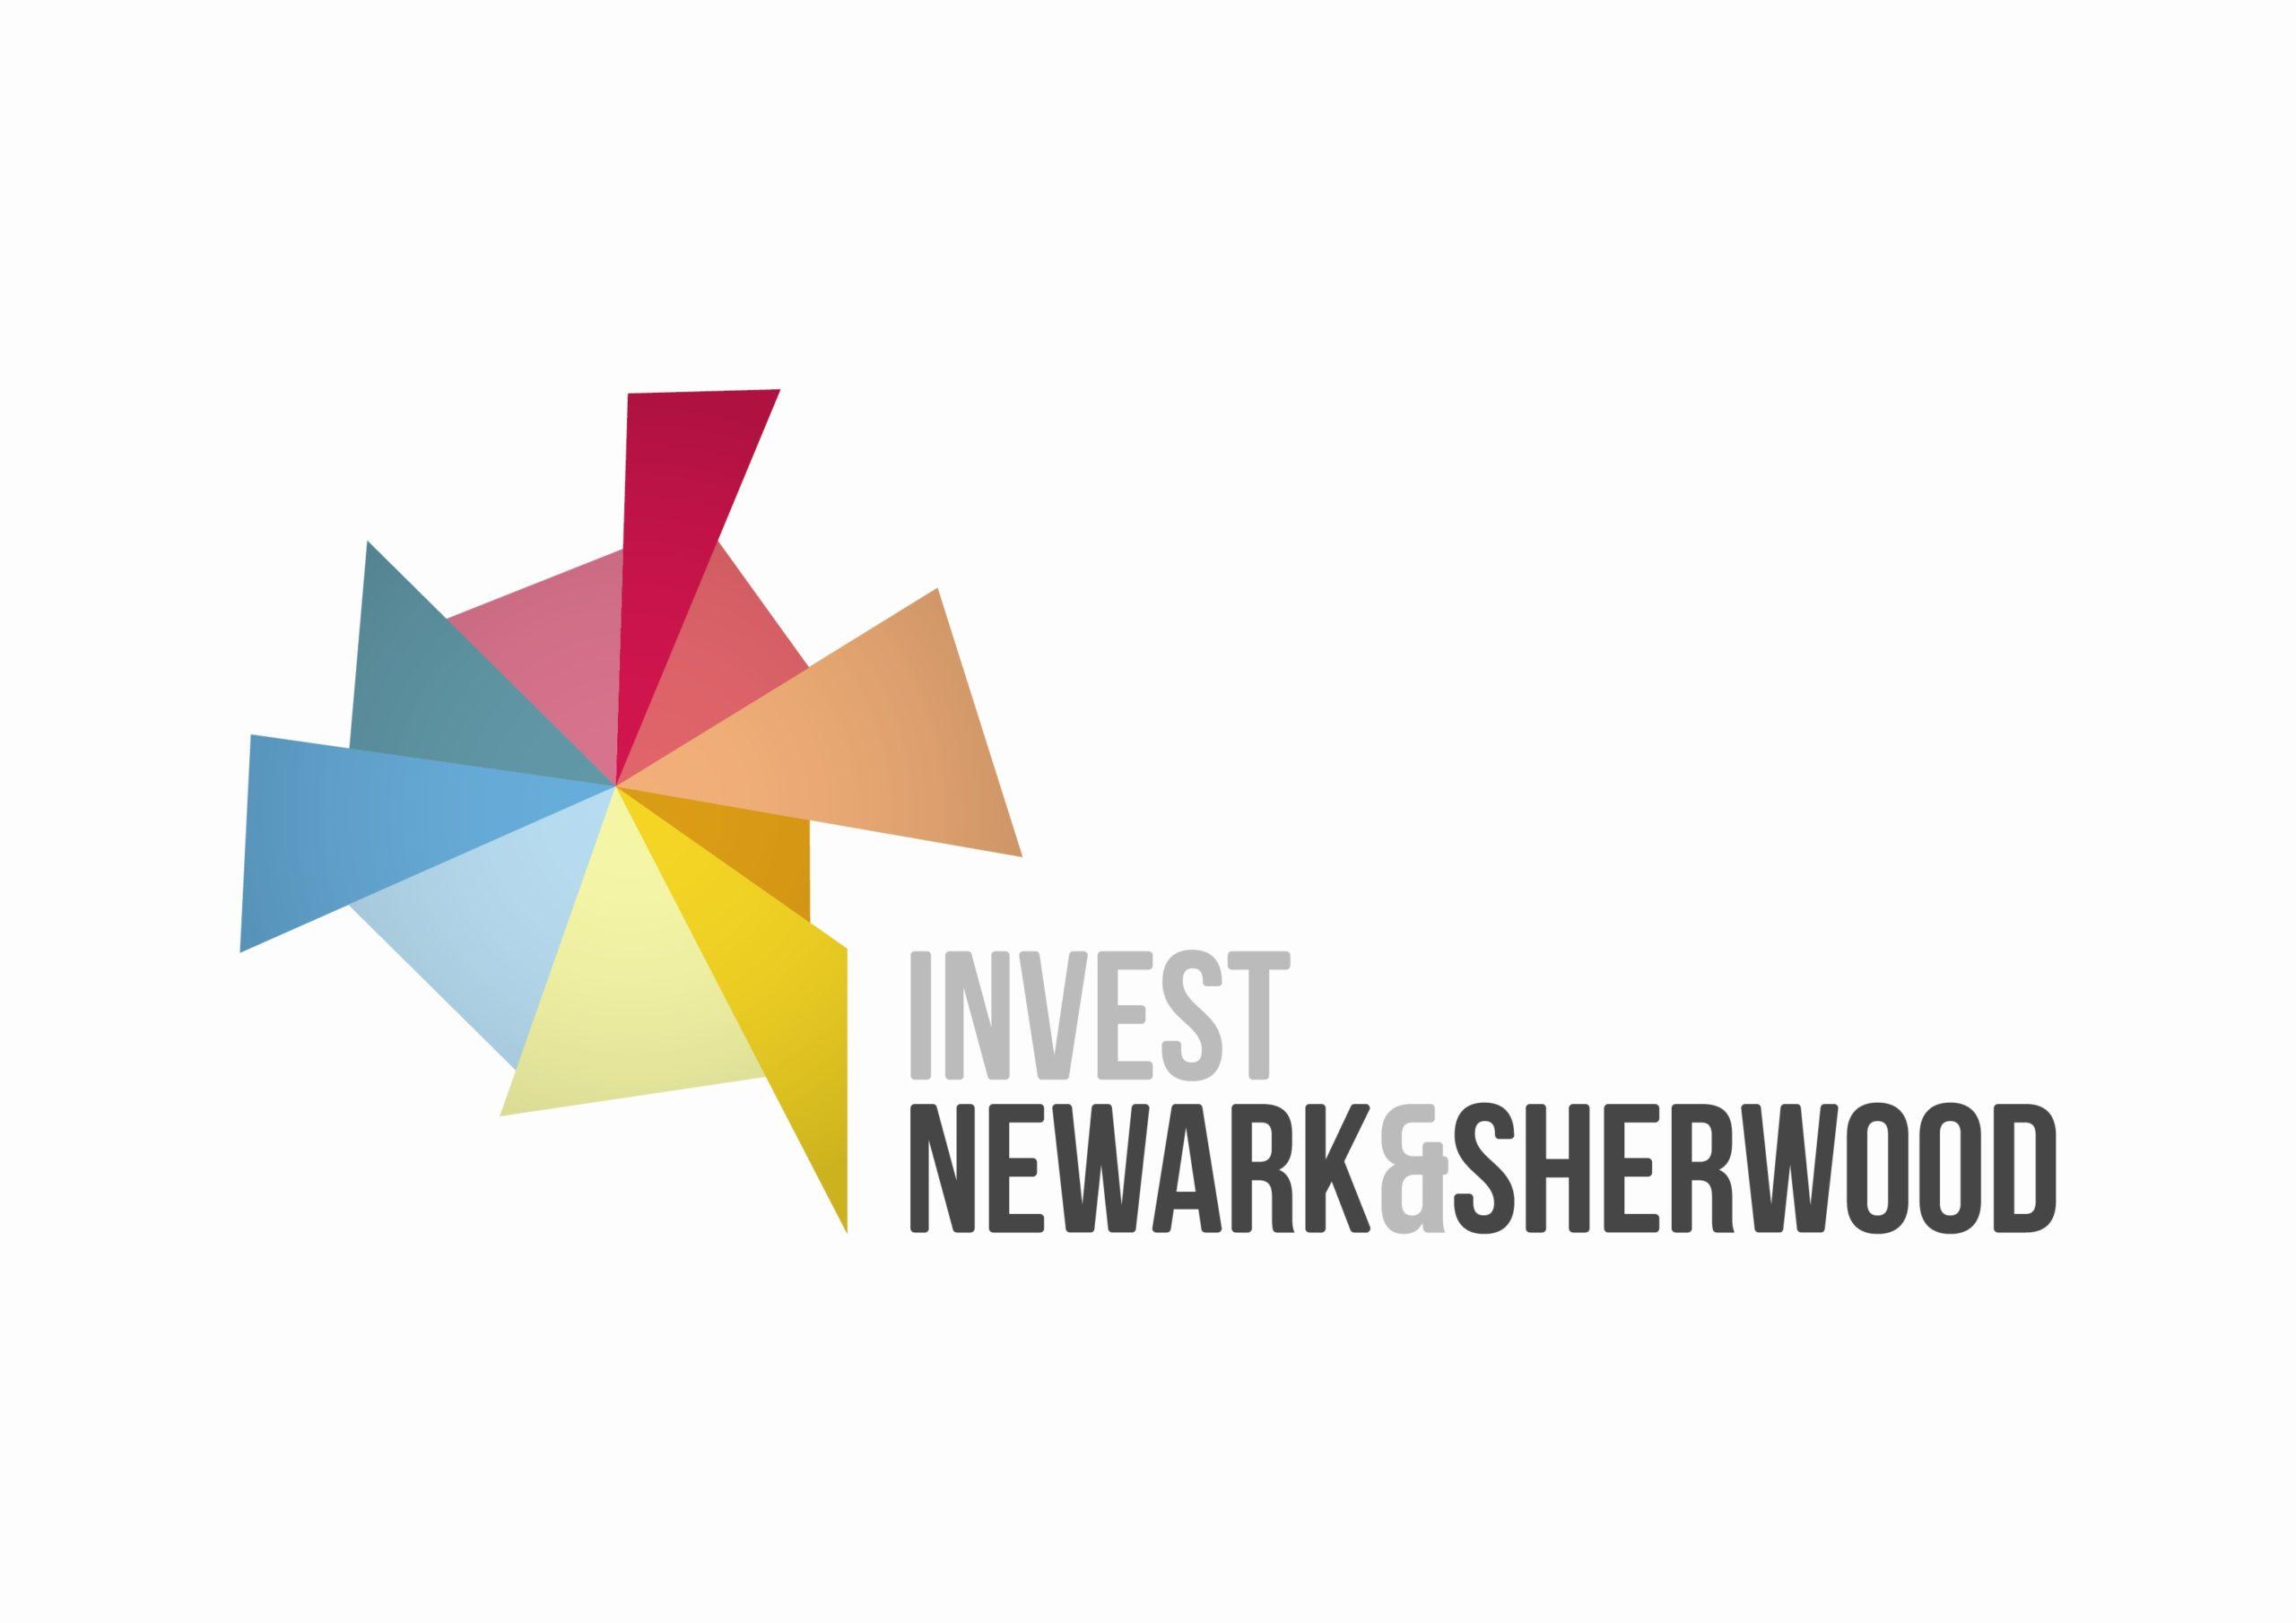 Invest Newark & Sherwood